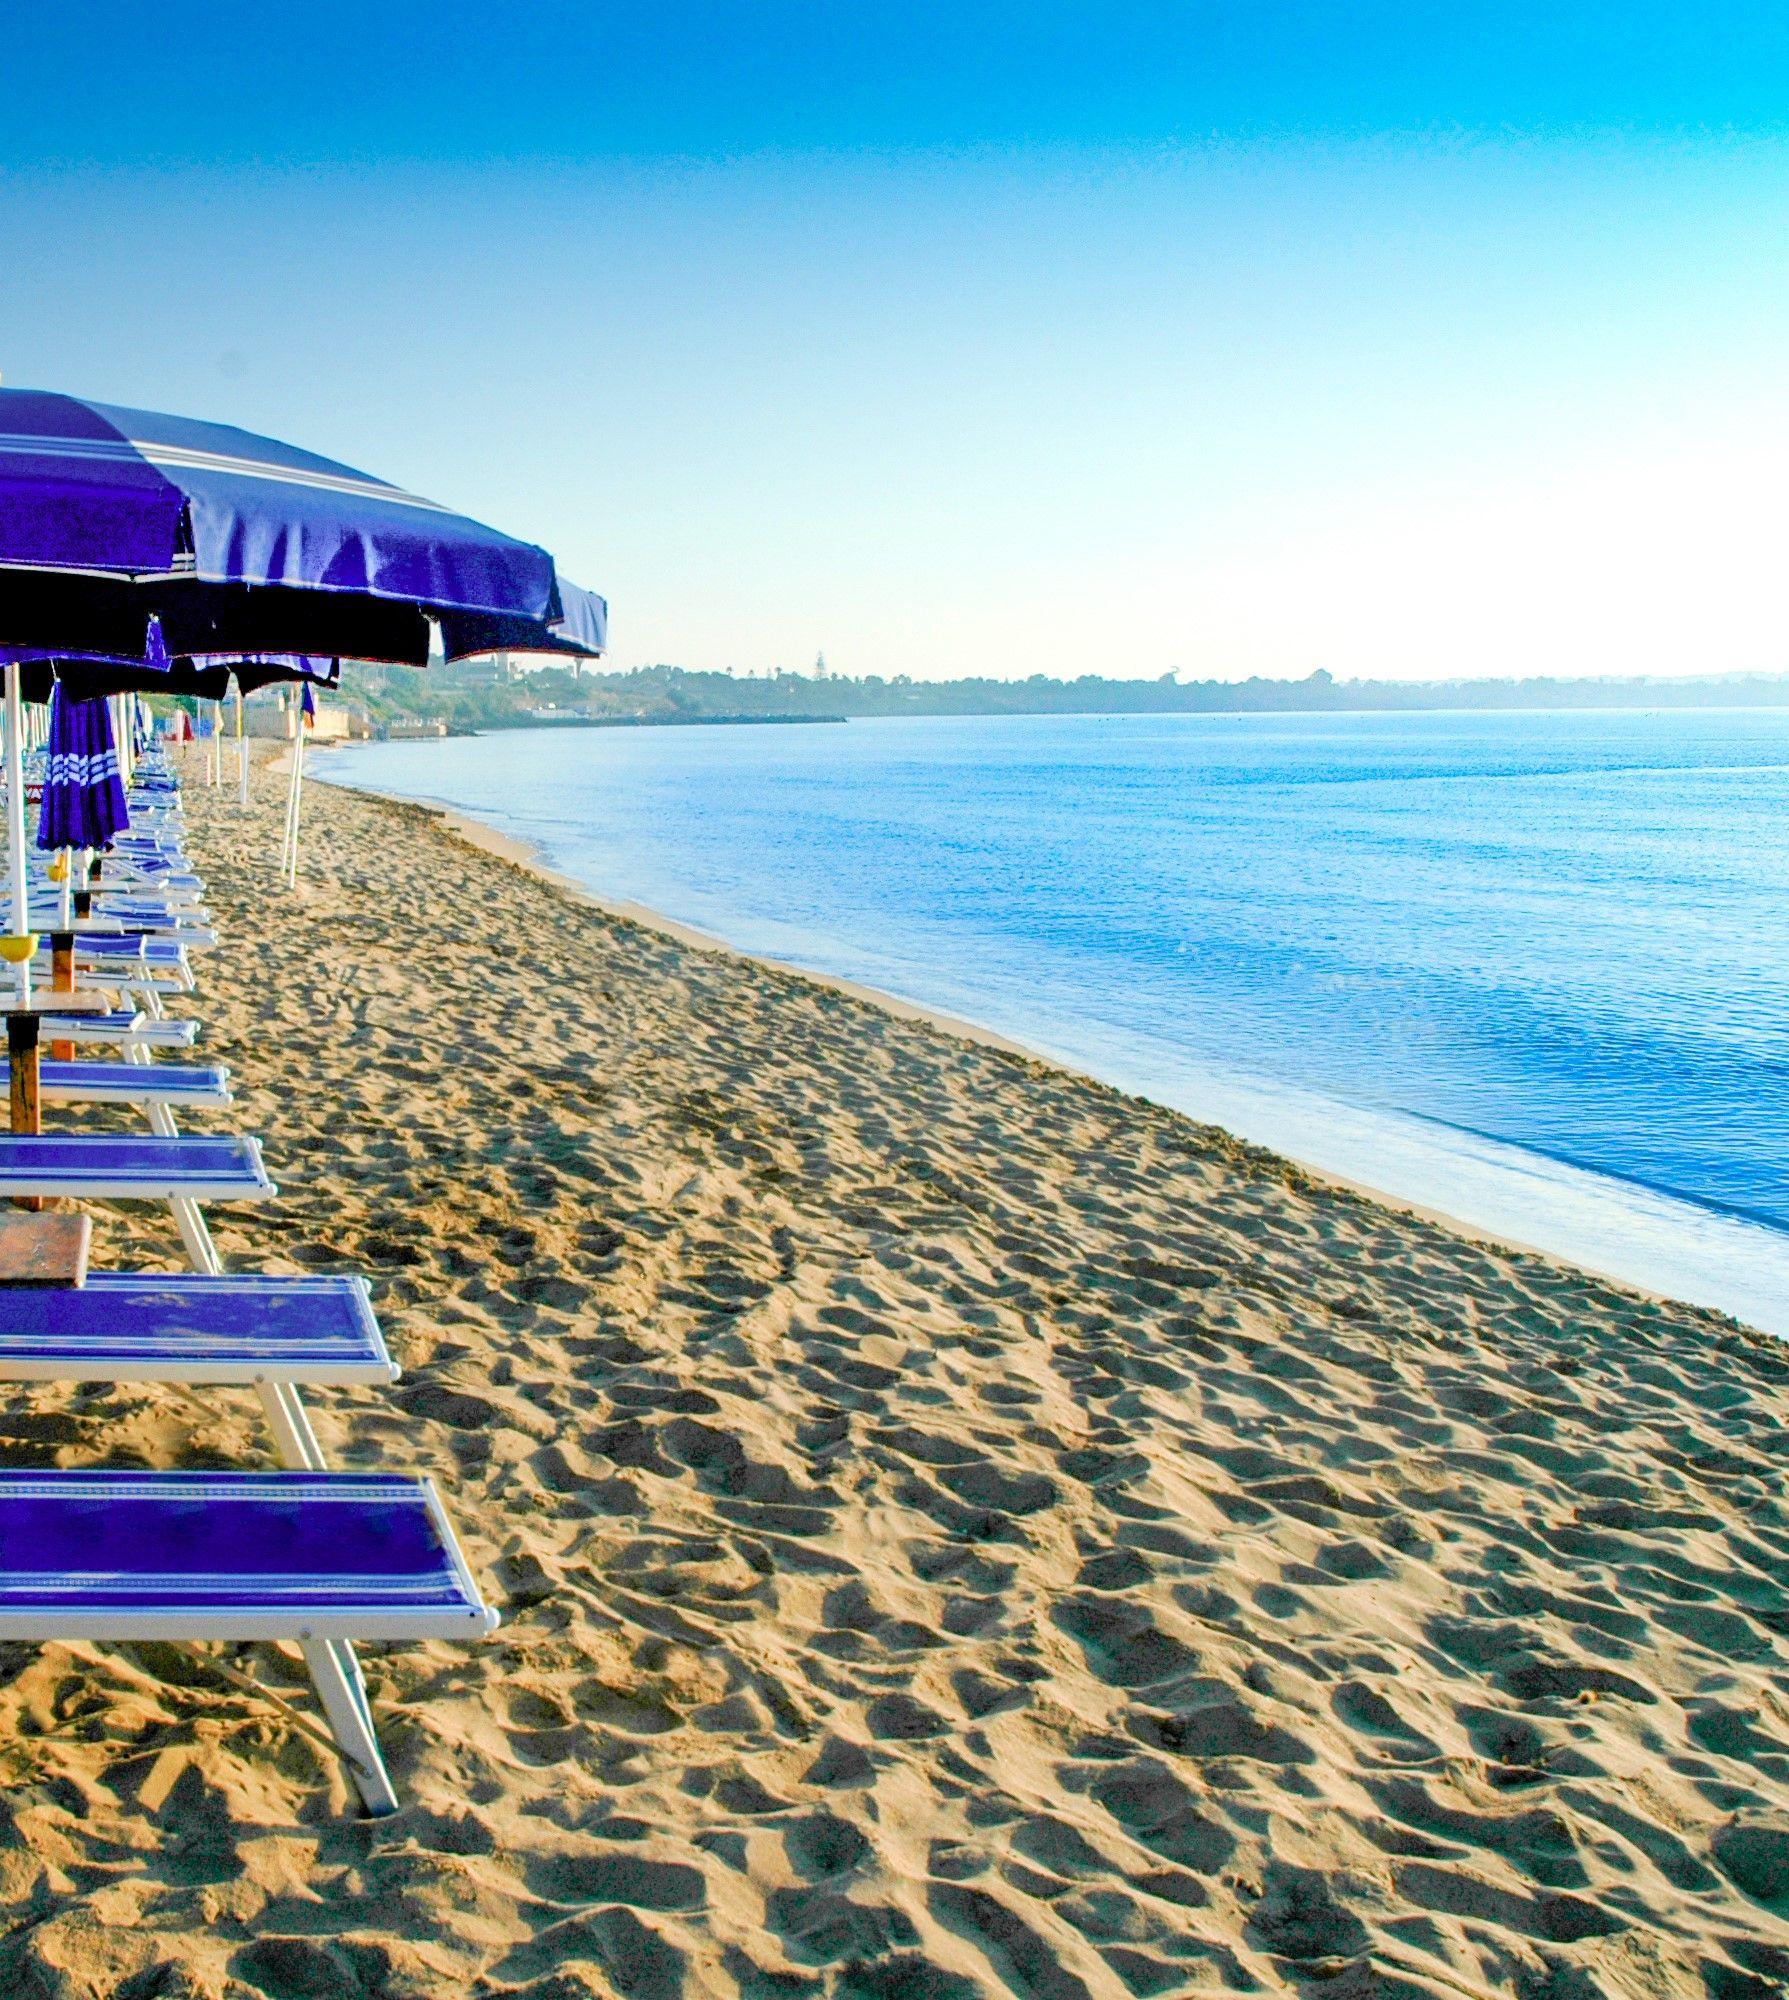 italien urlaub aranella resort hotel strand sandstrand